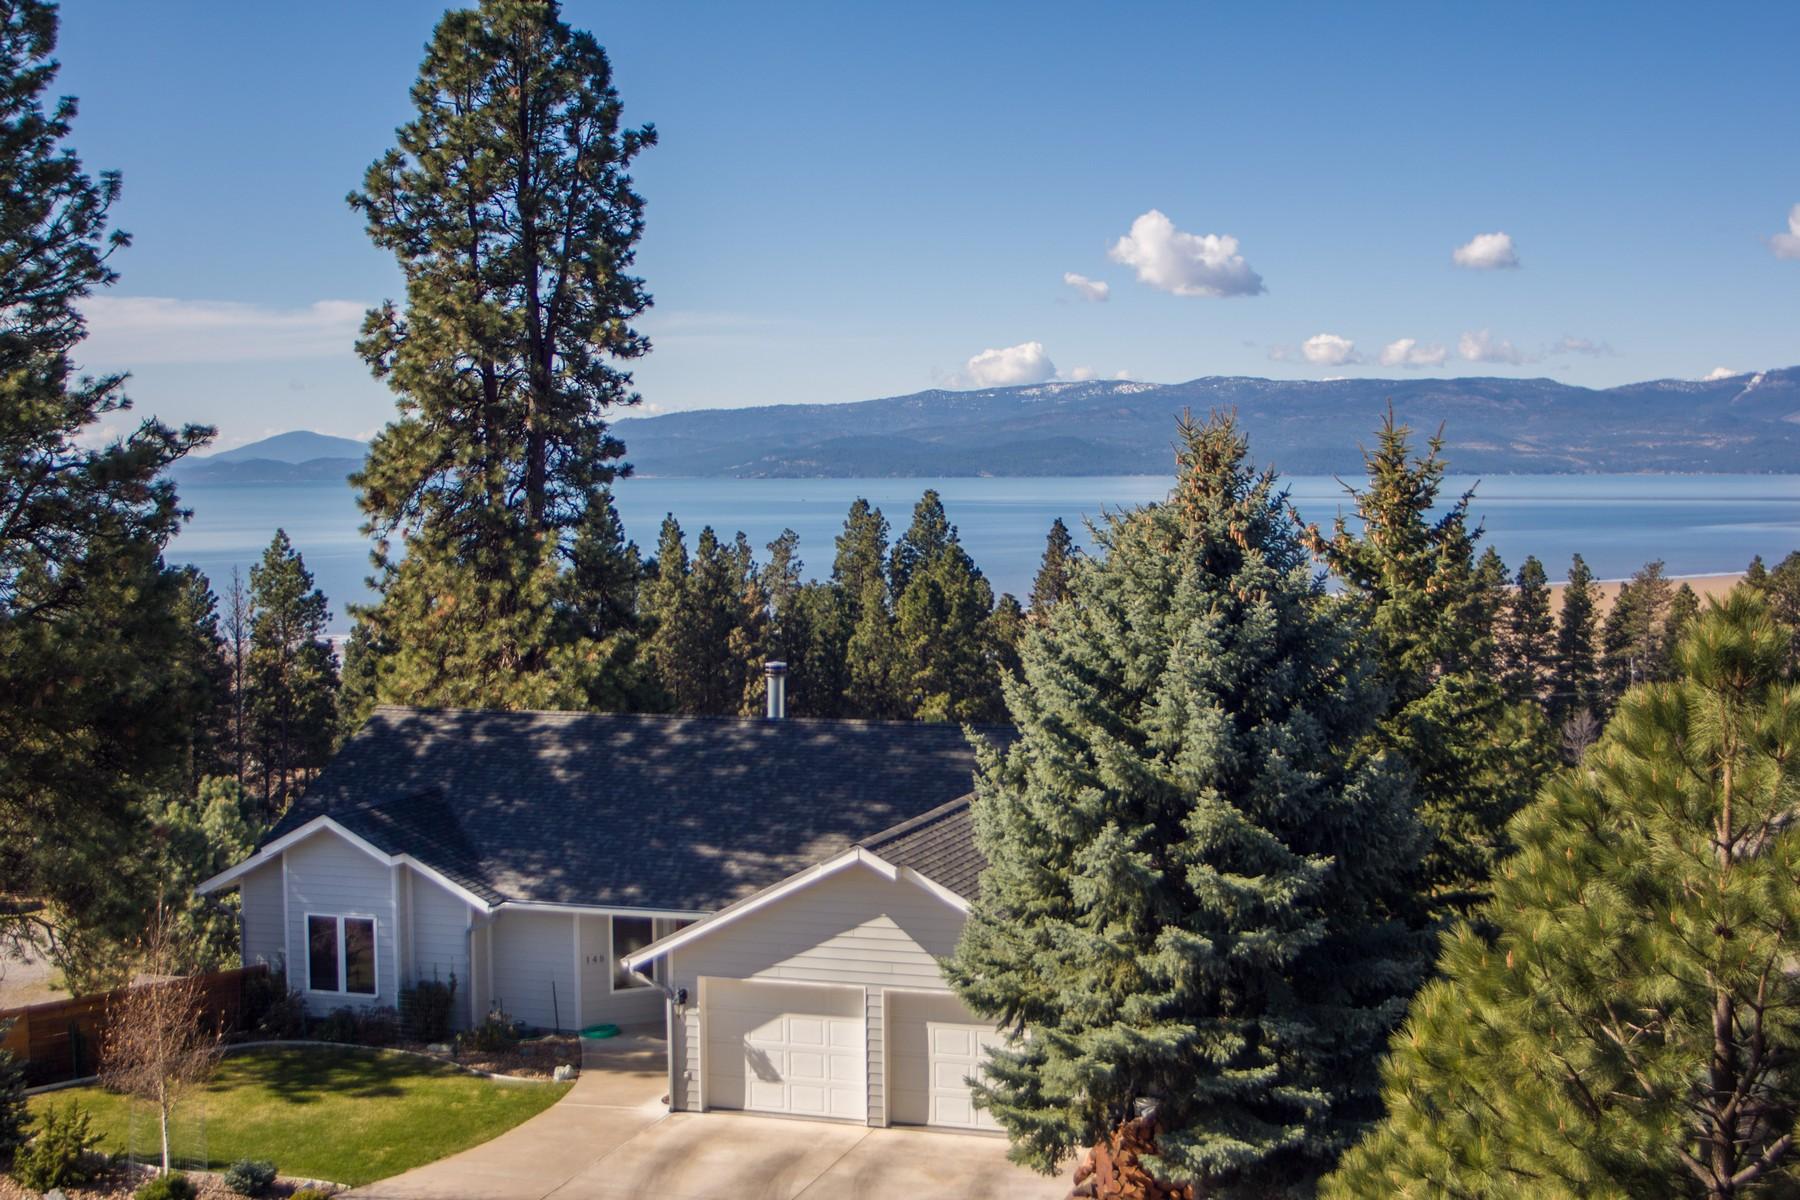 Casa Unifamiliar por un Venta en Bigfork Rancher 148 S. Crestview Terrace Bigfork, Montana 59911 Estados Unidos